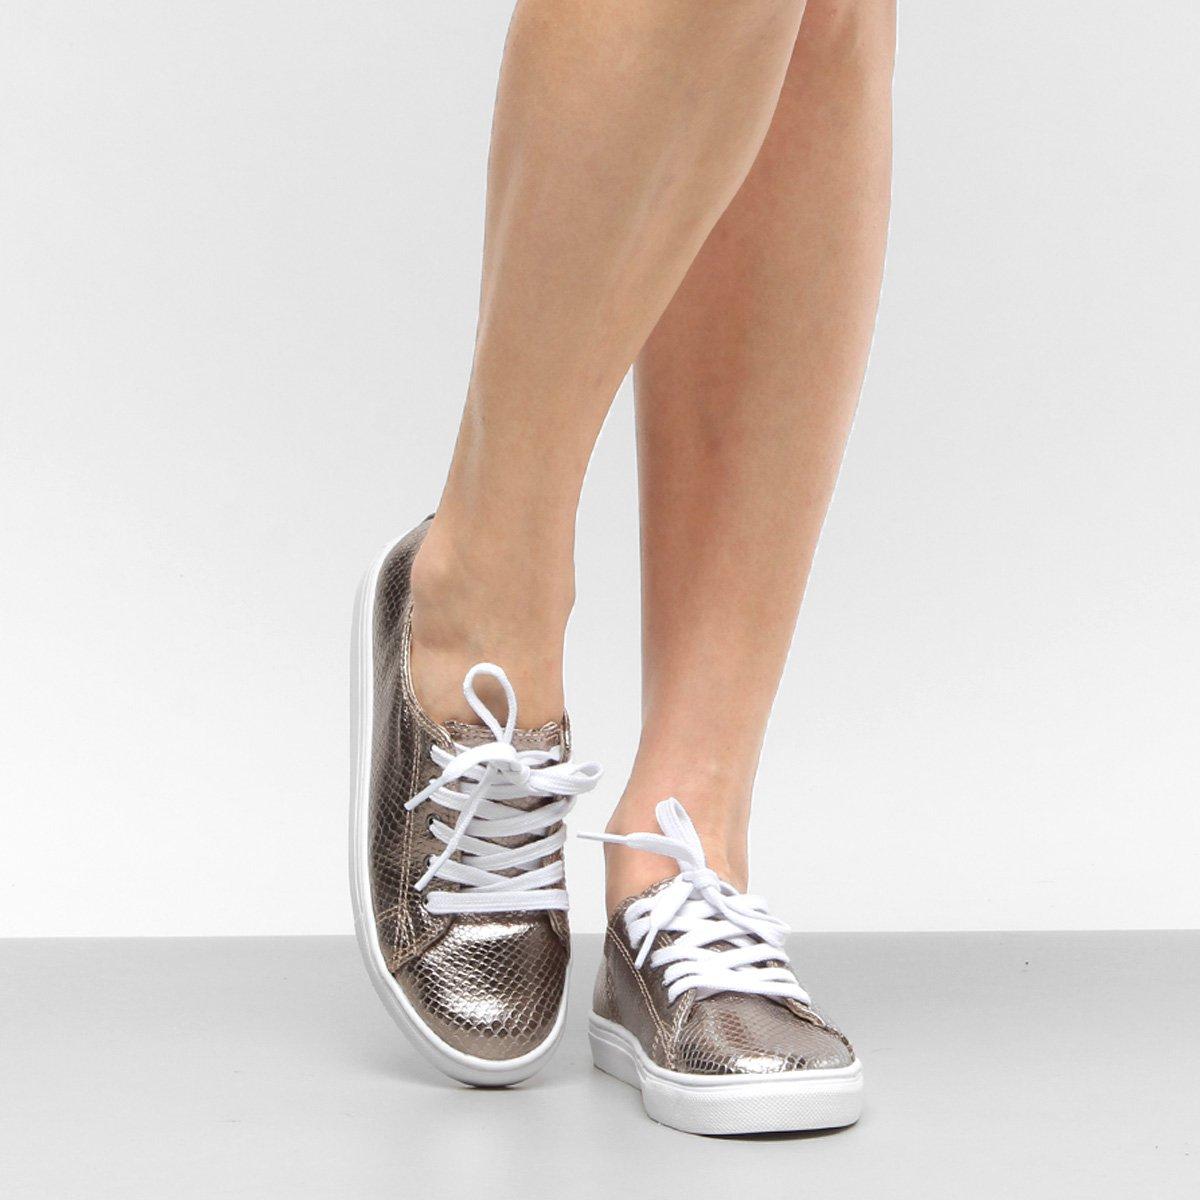 6aa52f441 Tênis Couro Shoestock Cobra Metalizado Feminino | Shoestock